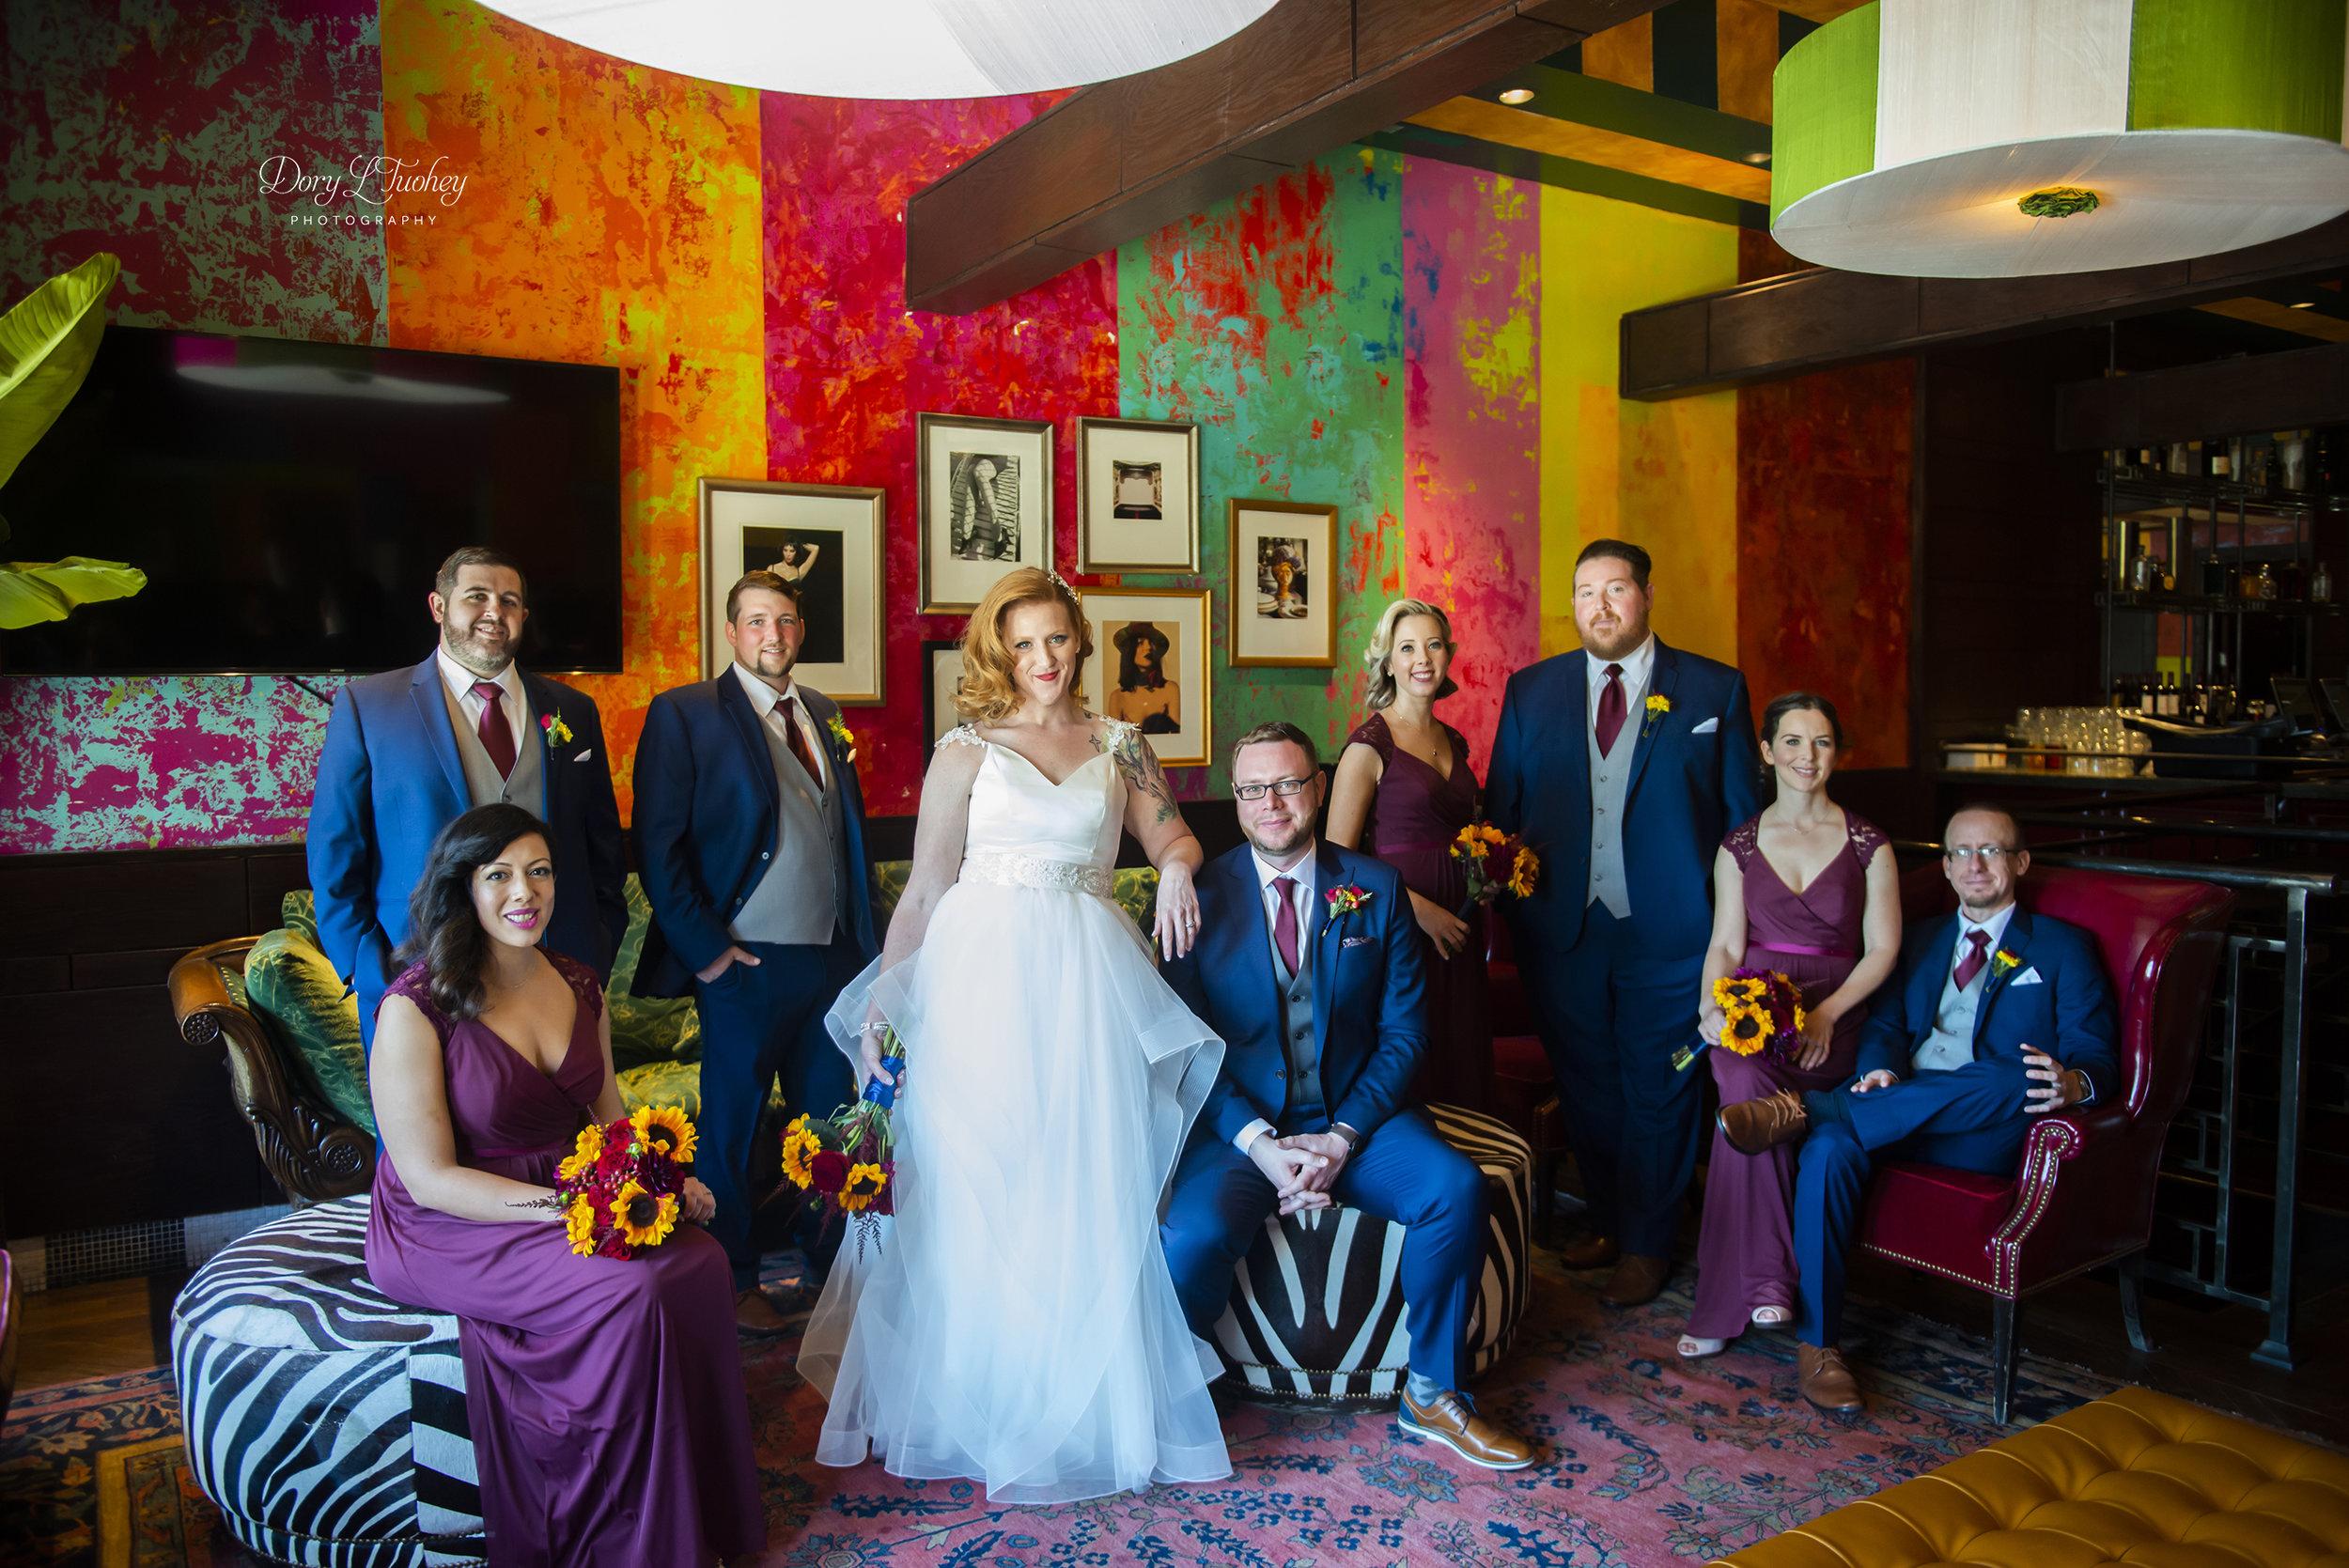 Carnivale_chicago_dory_wedding_vintage_bride_red_lips_paint_mural_groom_06.jpg